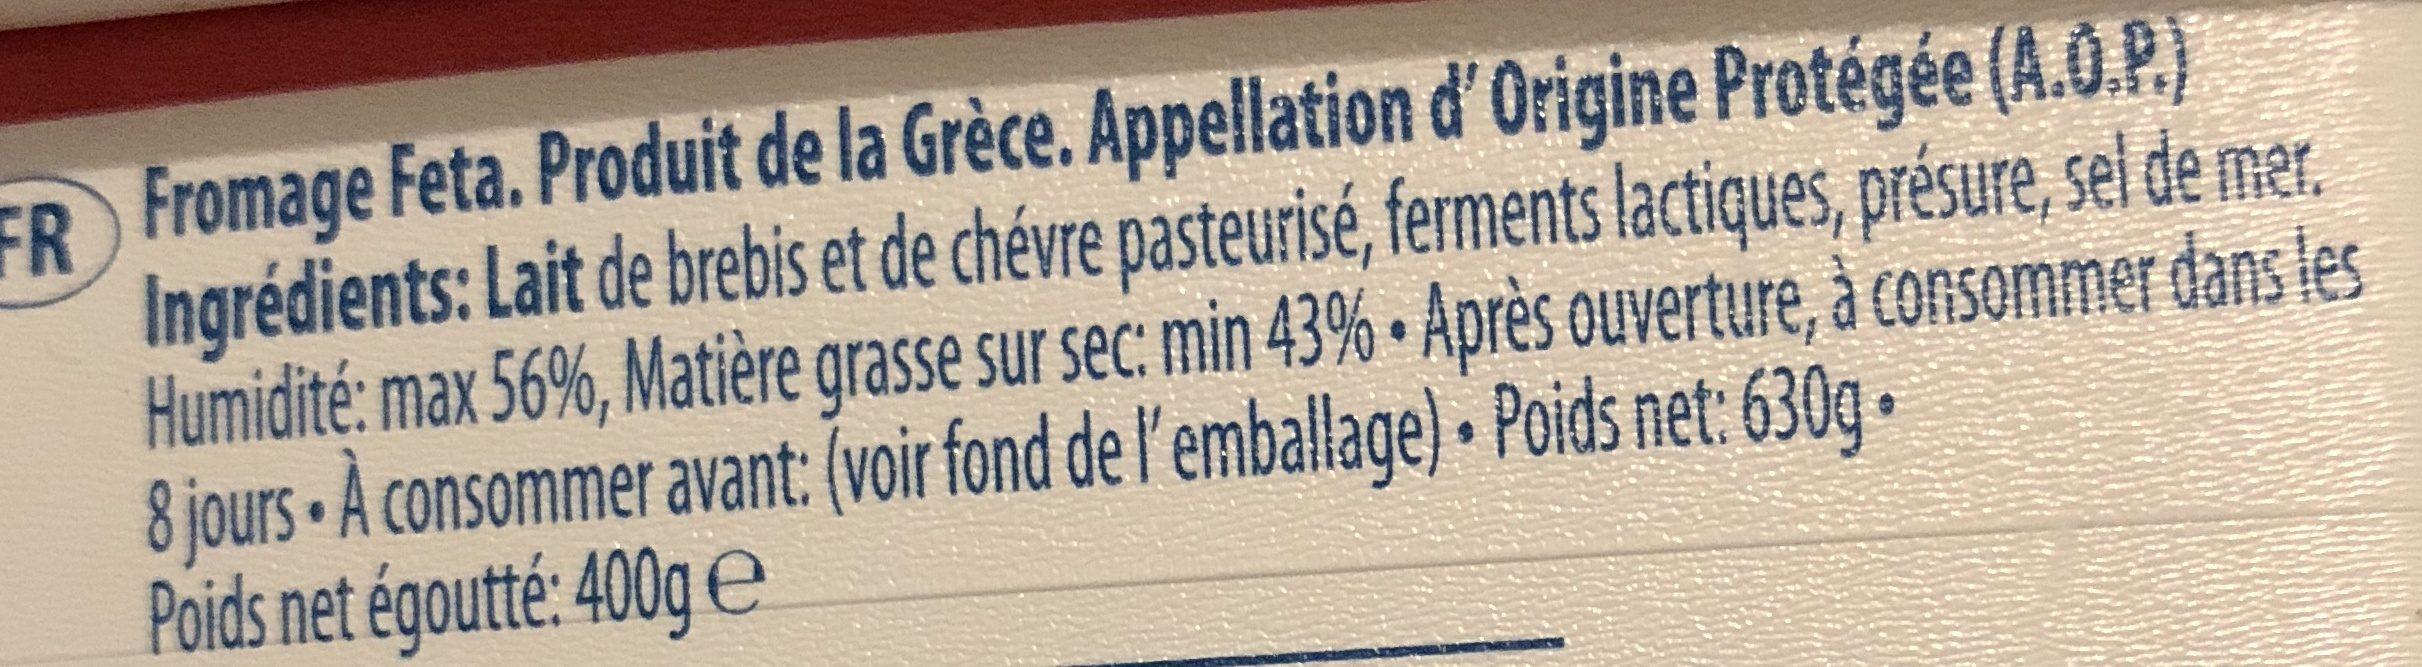 Fromage Feta - Ingrédients - fr